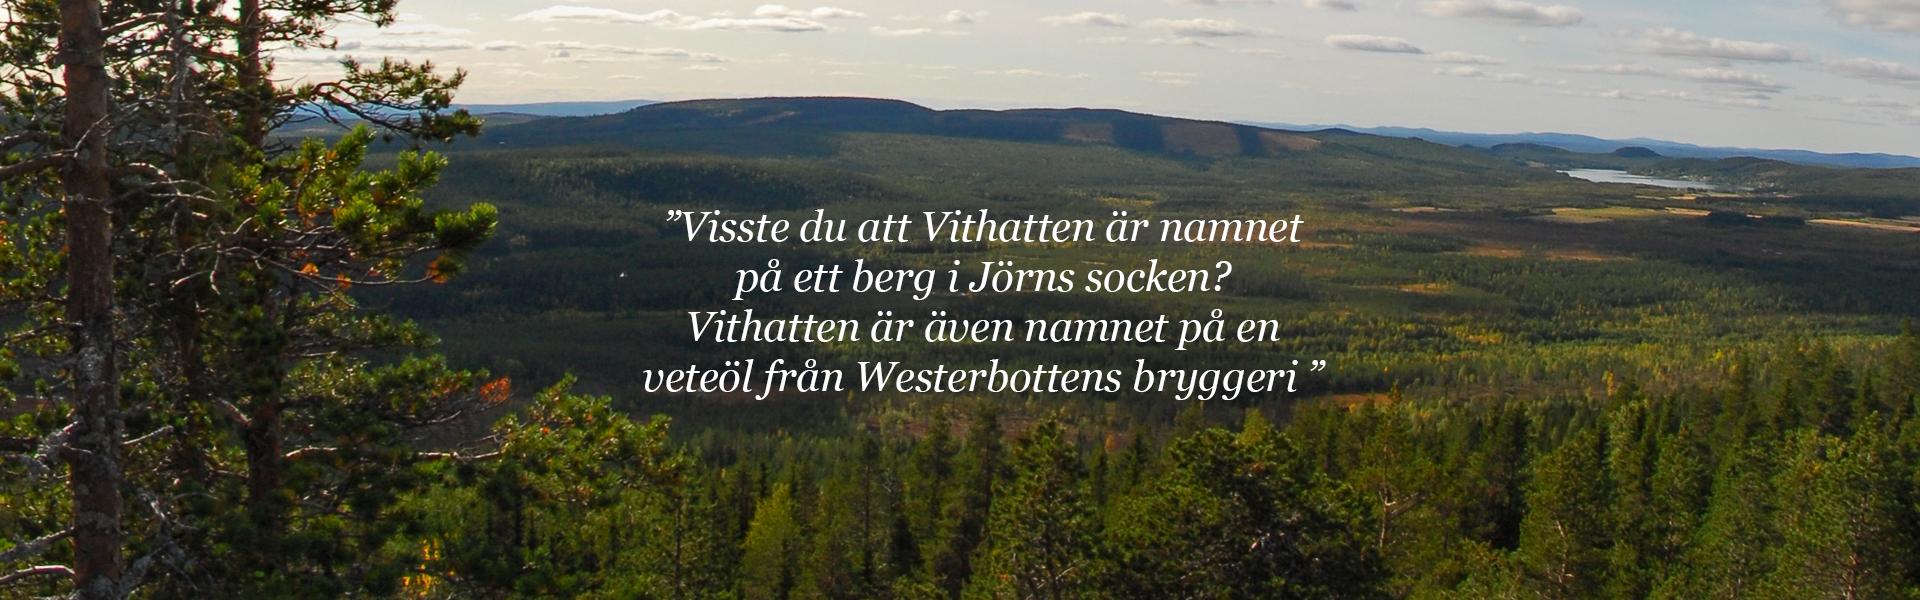 framsida_vithatten_fullvidd